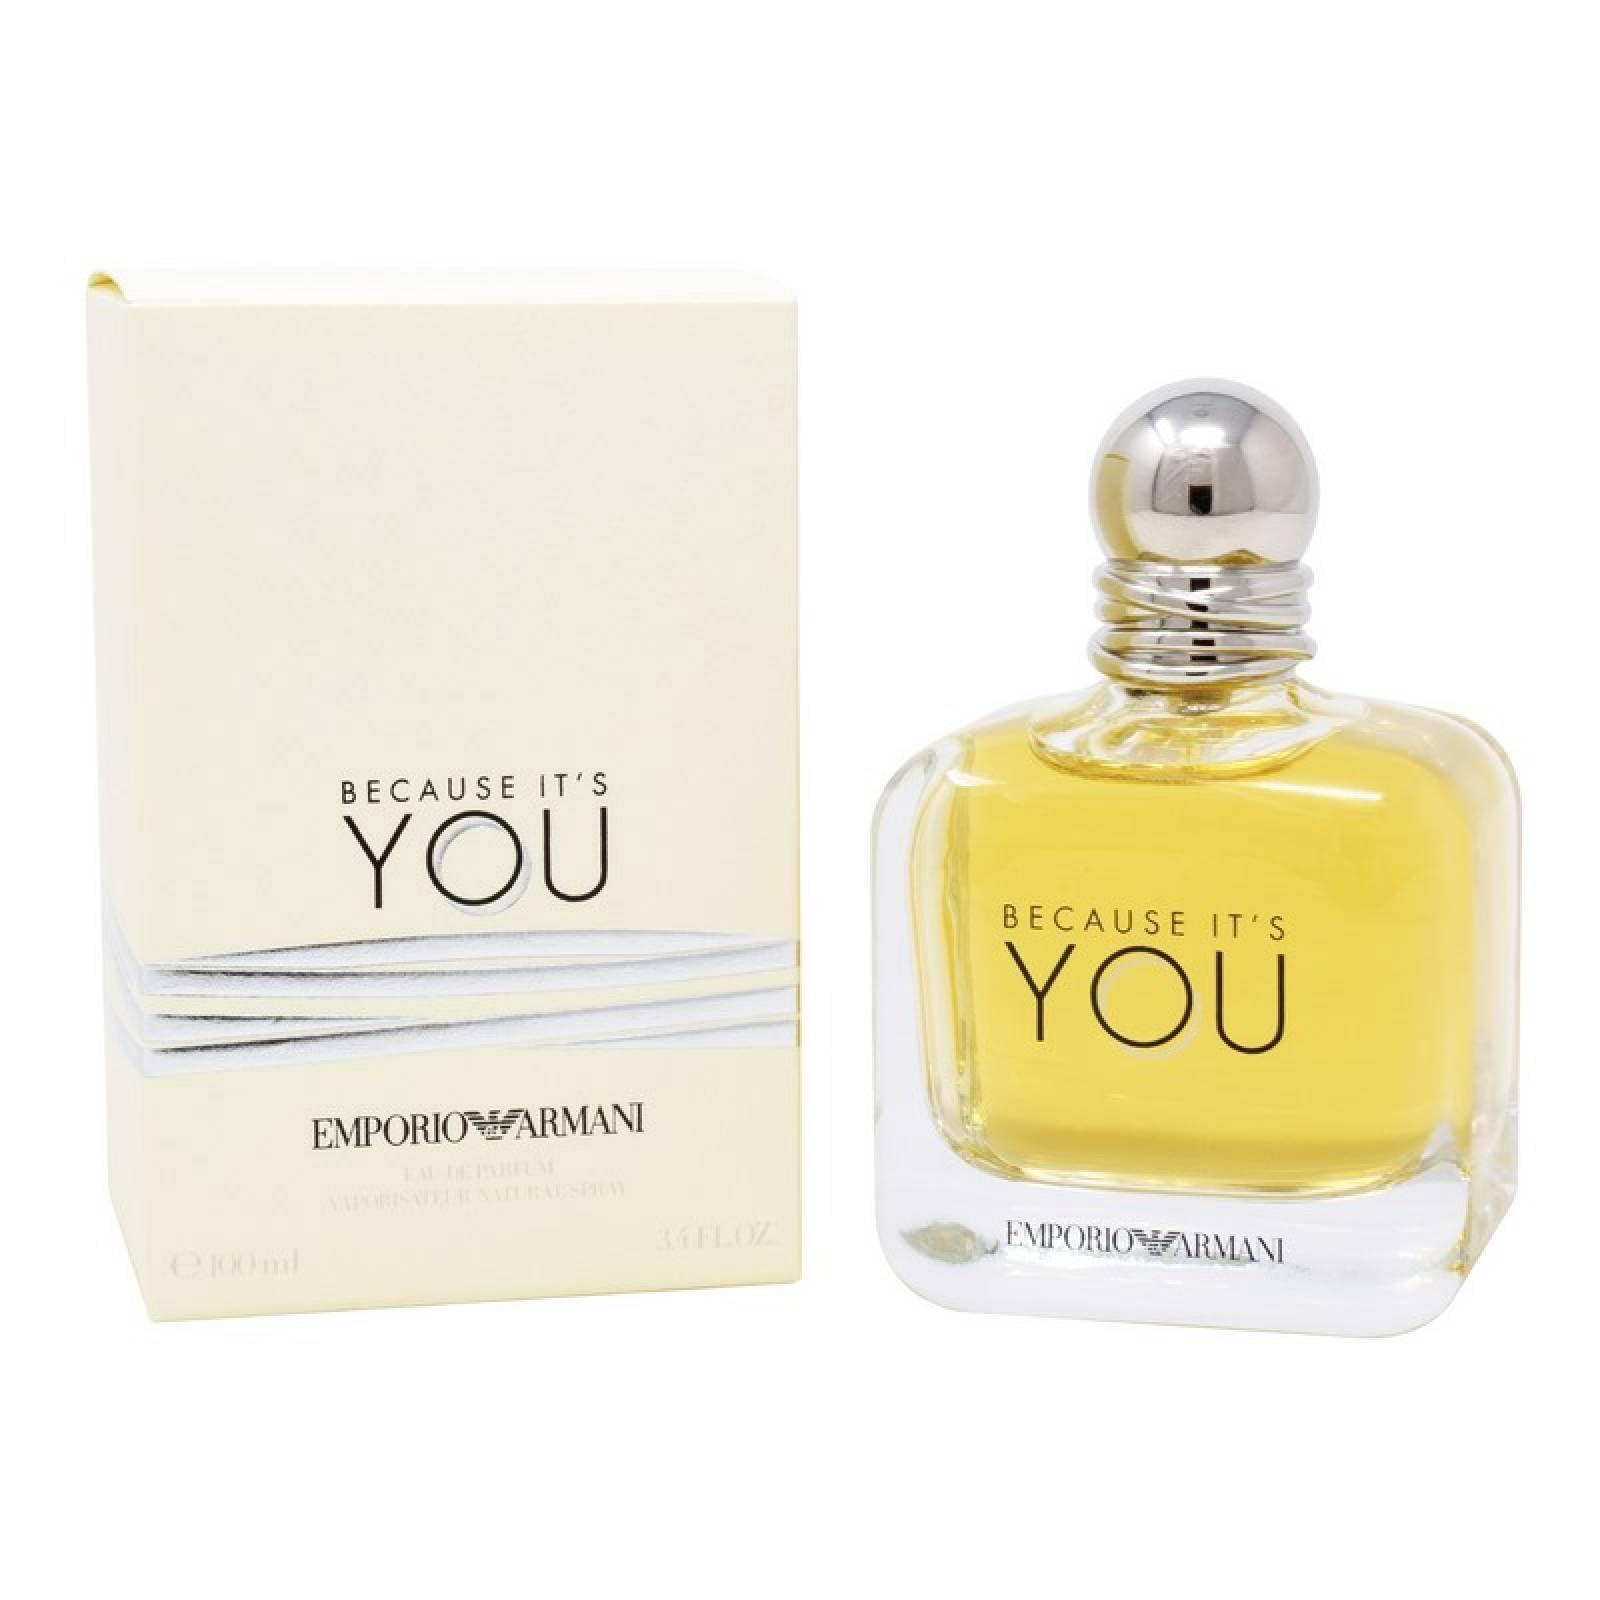 Emporio Armani Because It´S You 100 ml Edp Spray de Giorgio Armani para Dama